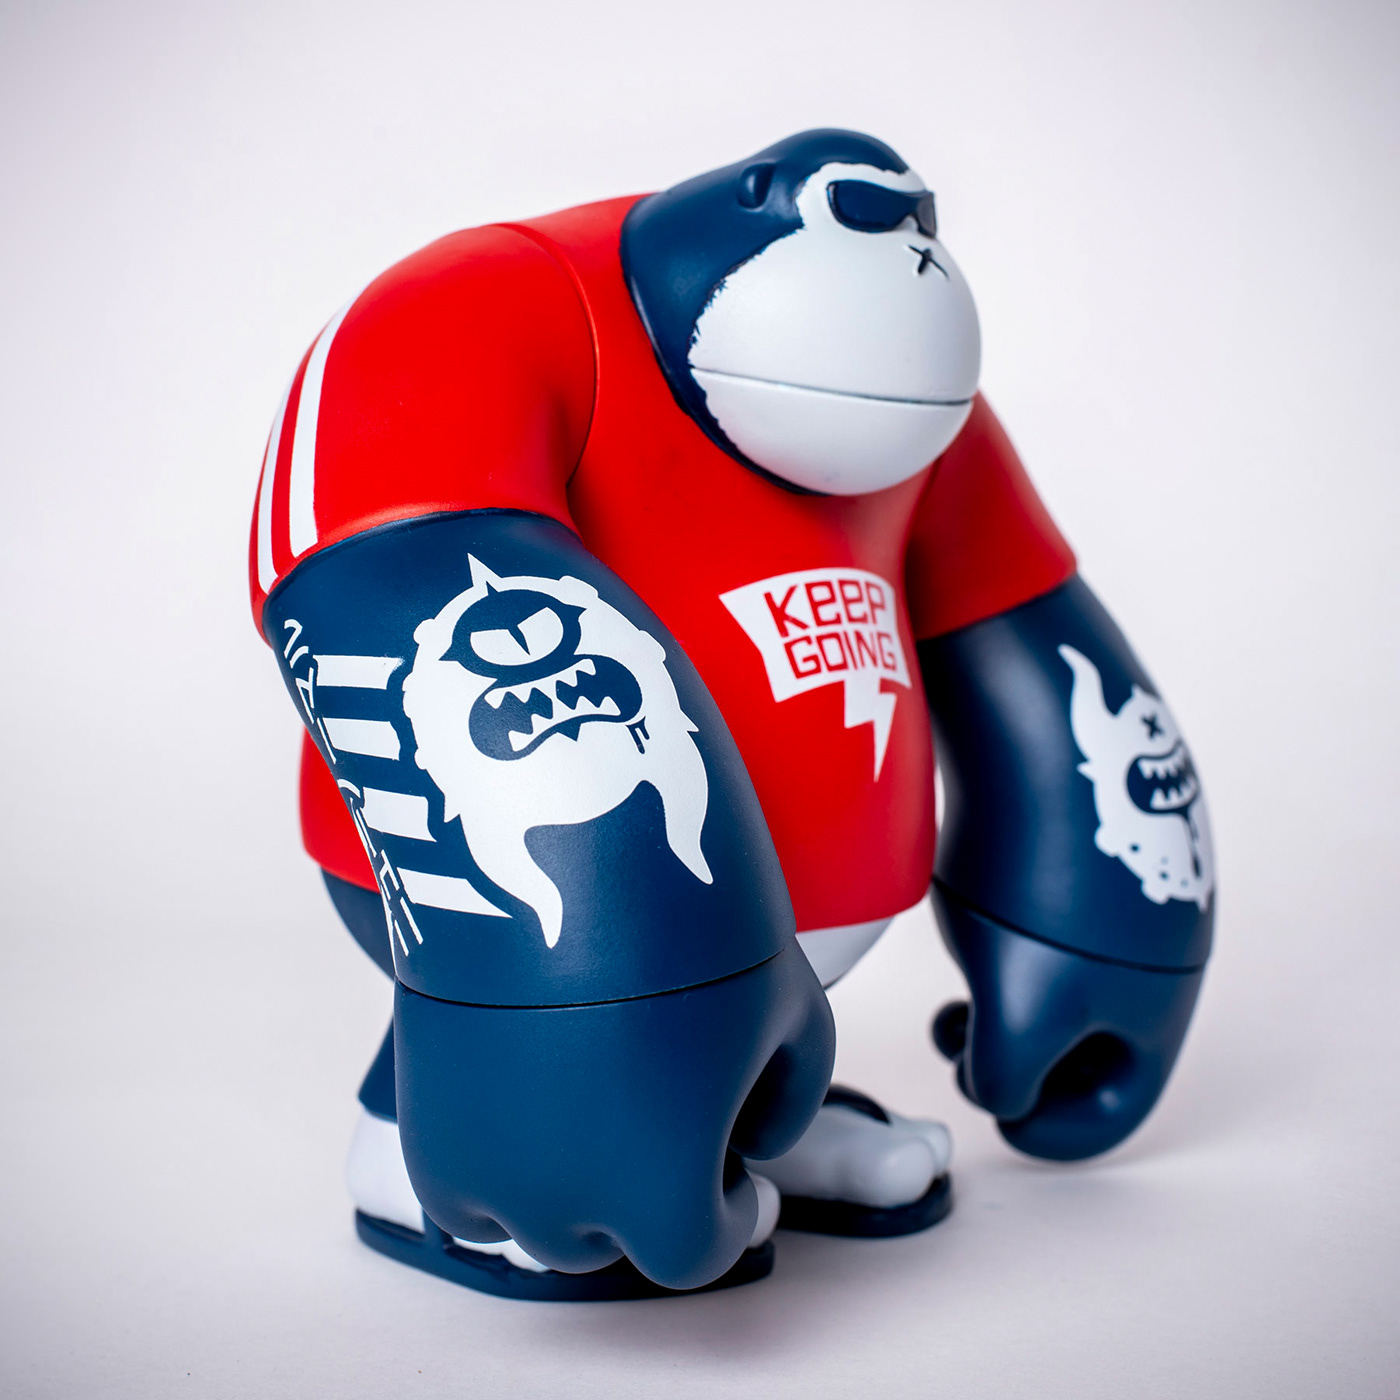 art toy artist ART TOY CULTURE Custom designer Designer toys